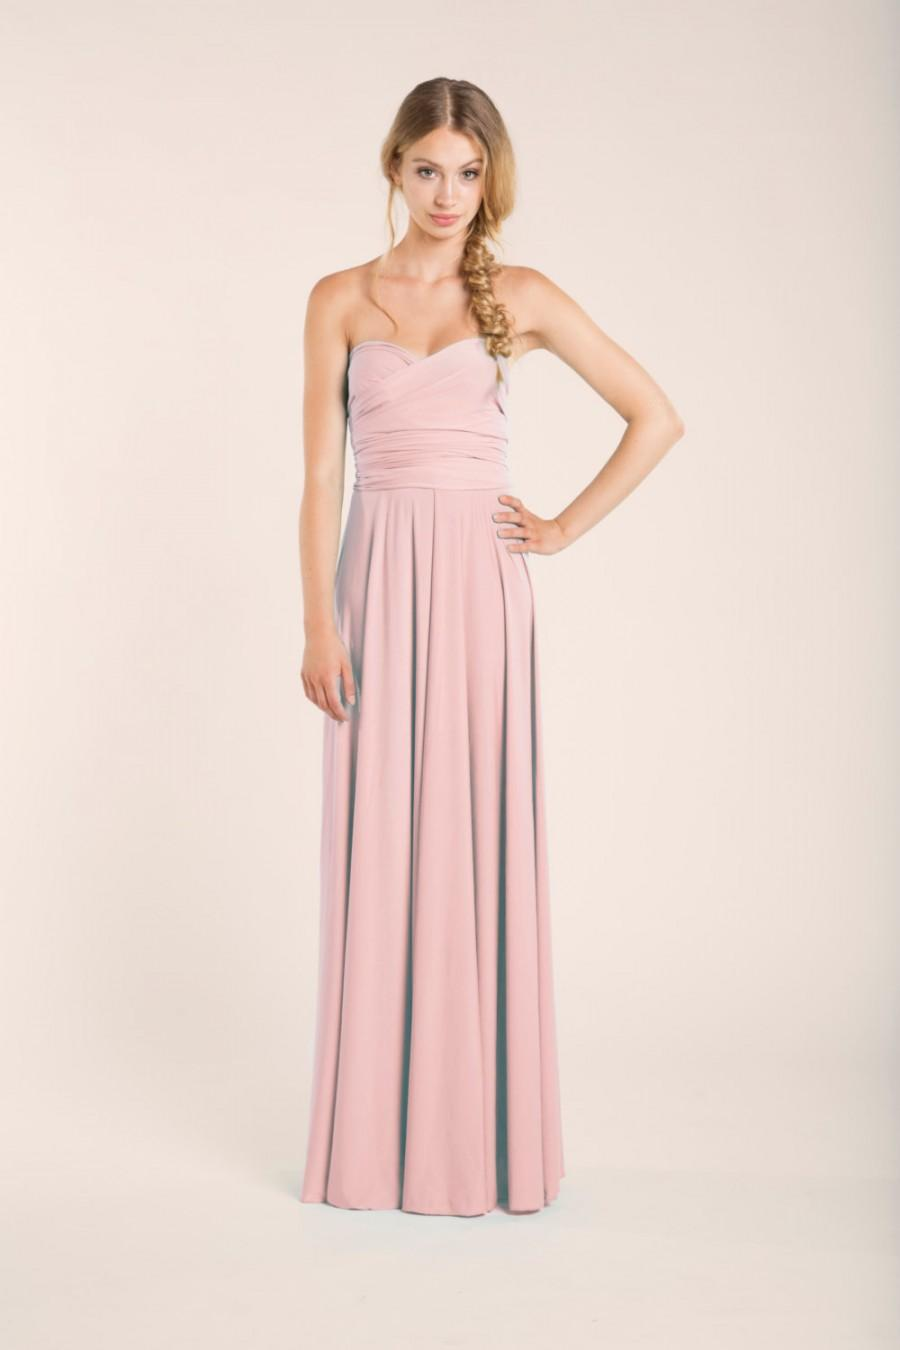 wedding dresses blush color blush pink wedding dresses Custom Made Blush Colored Illusion Dropped Waist Luxury Wedding